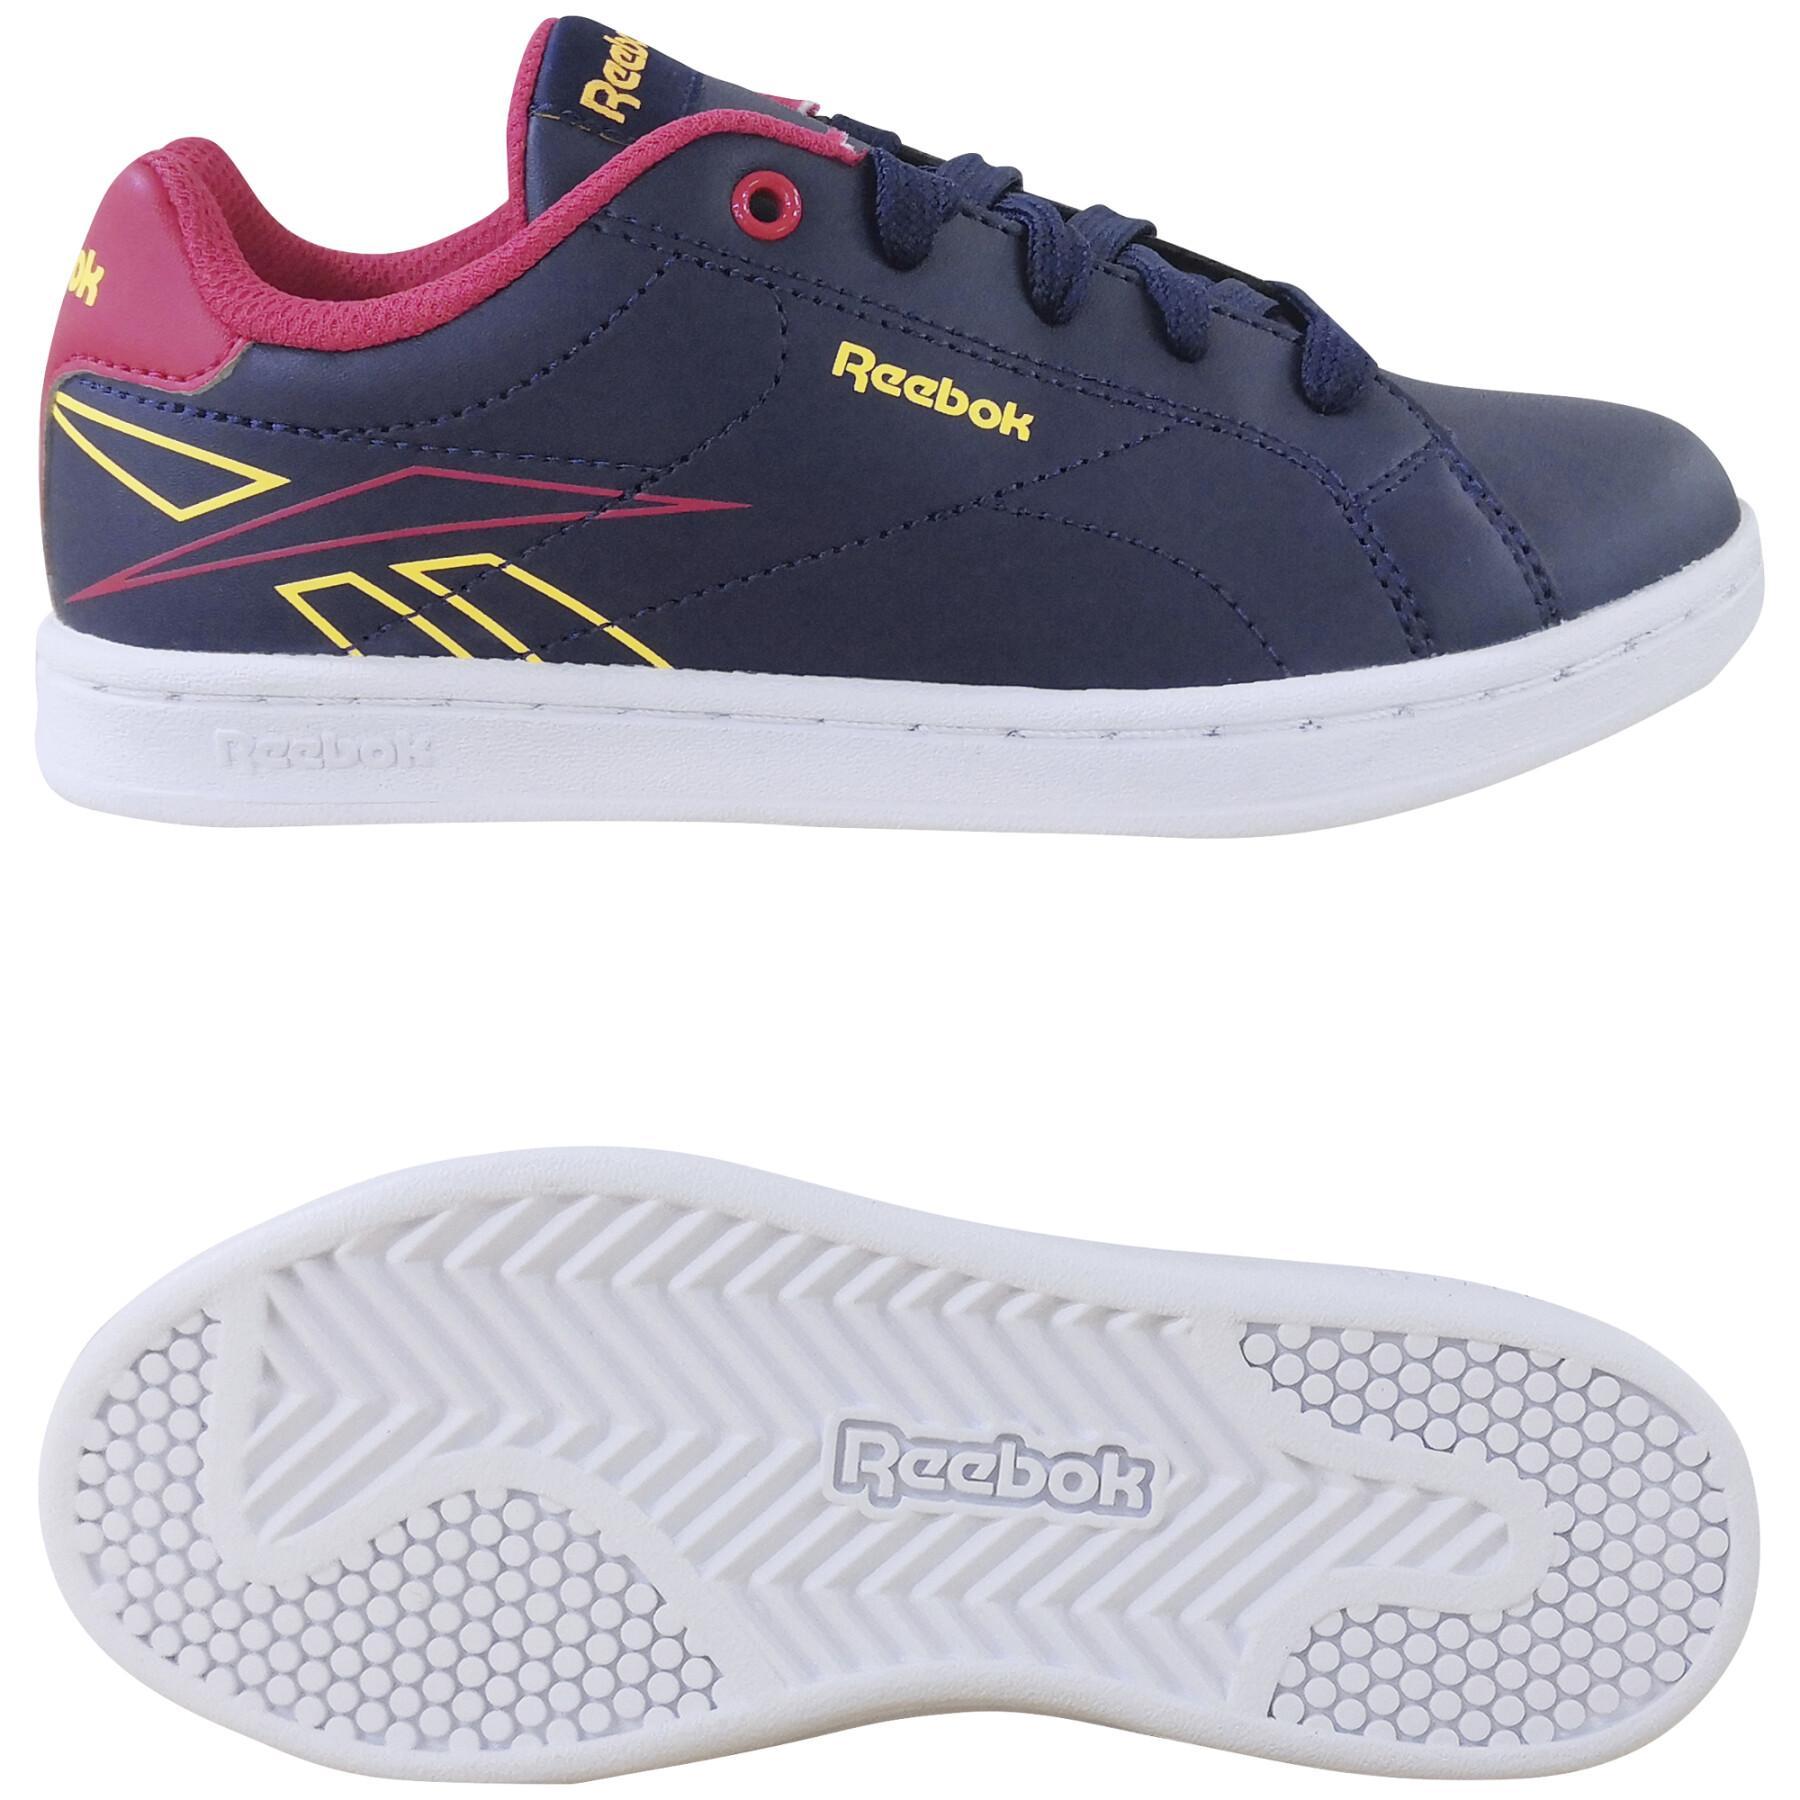 Children's shoes Reebok Royal Complete 2